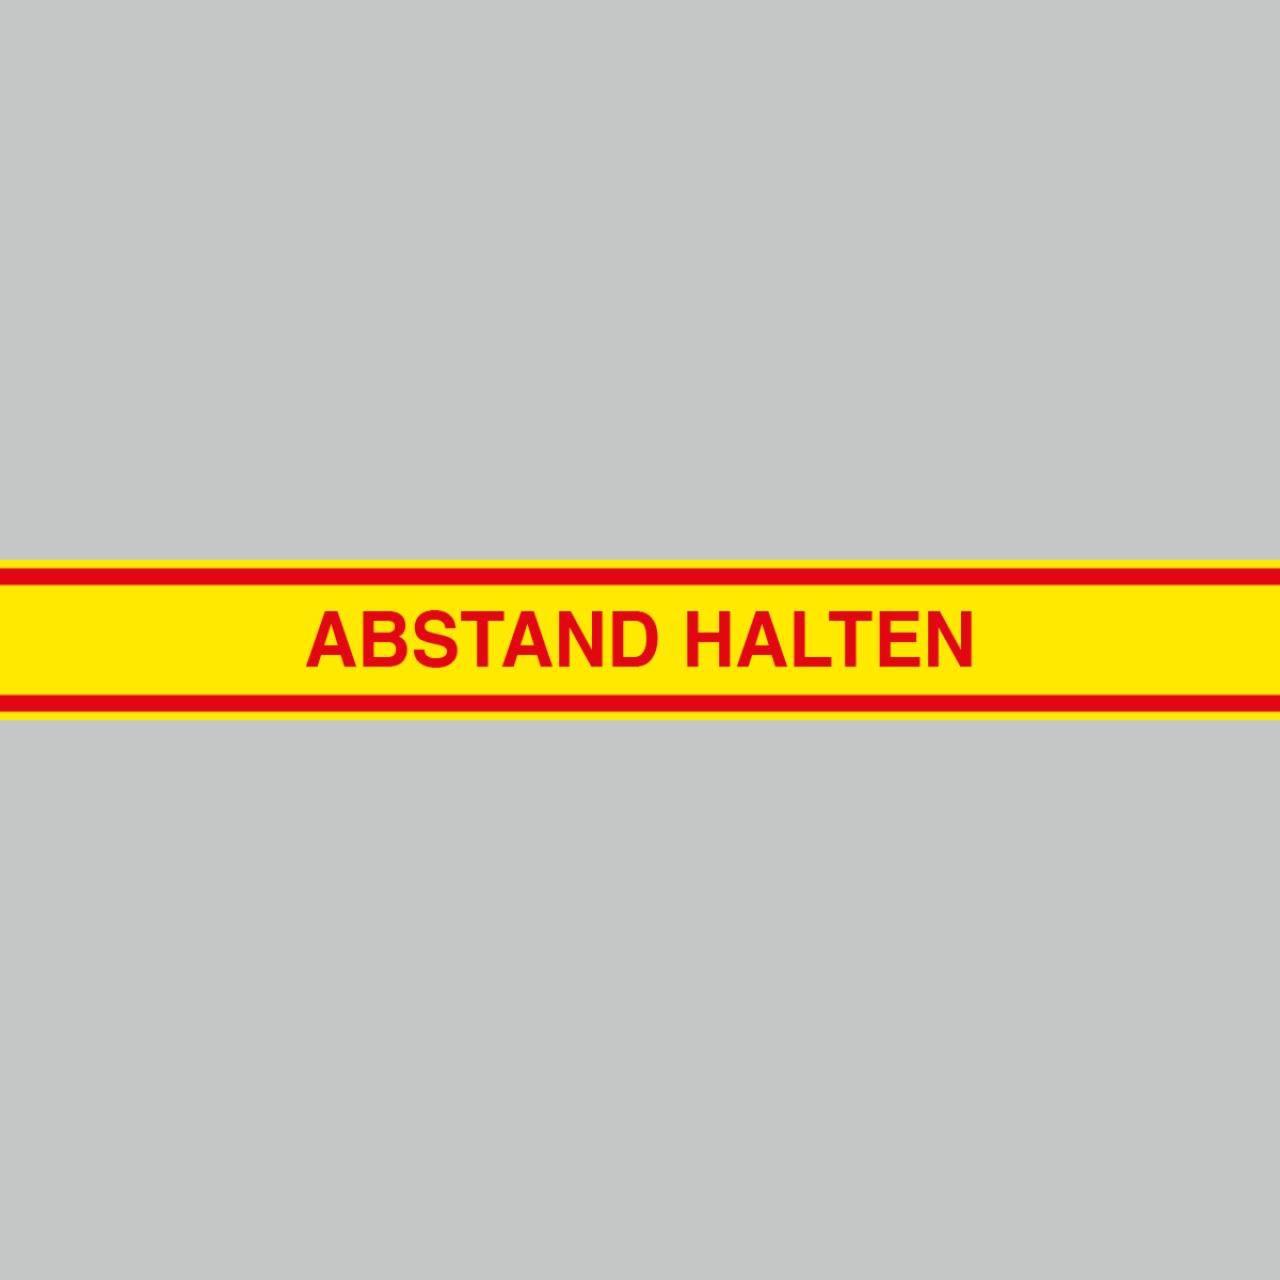 Fußbodenaufkleber rot-gelb, 120x15cm – Abstand halten